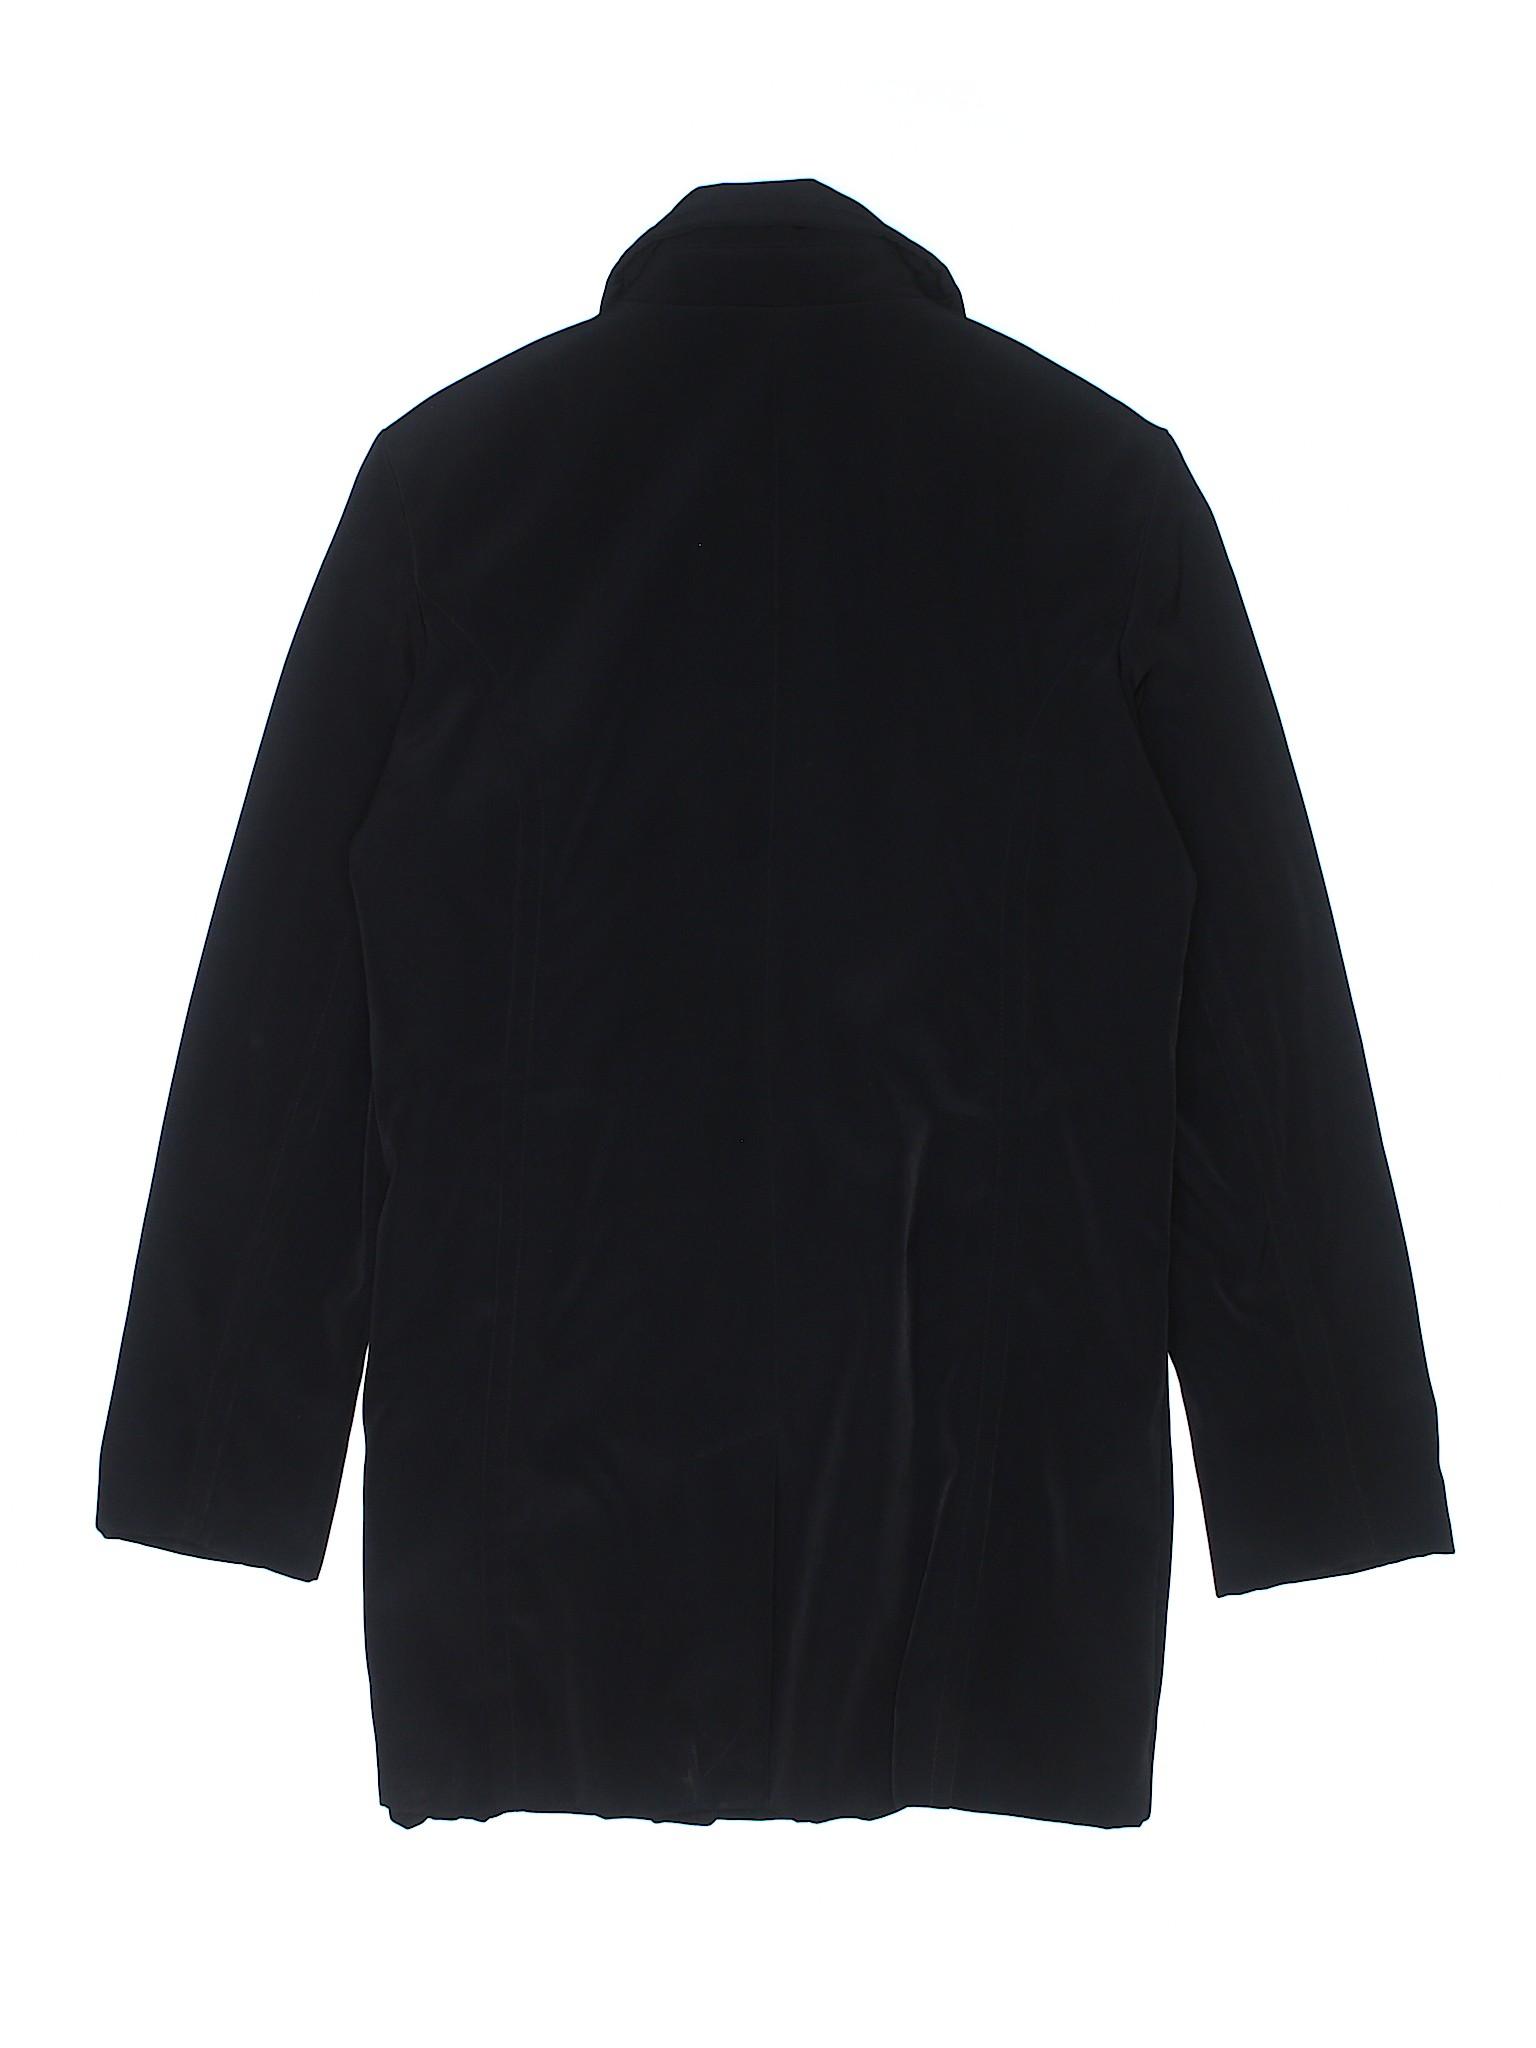 winter winter Boutique winter Merona Boutique winter Boutique Jacket Jacket Jacket Merona Boutique Merona Merona qYwx5p6F